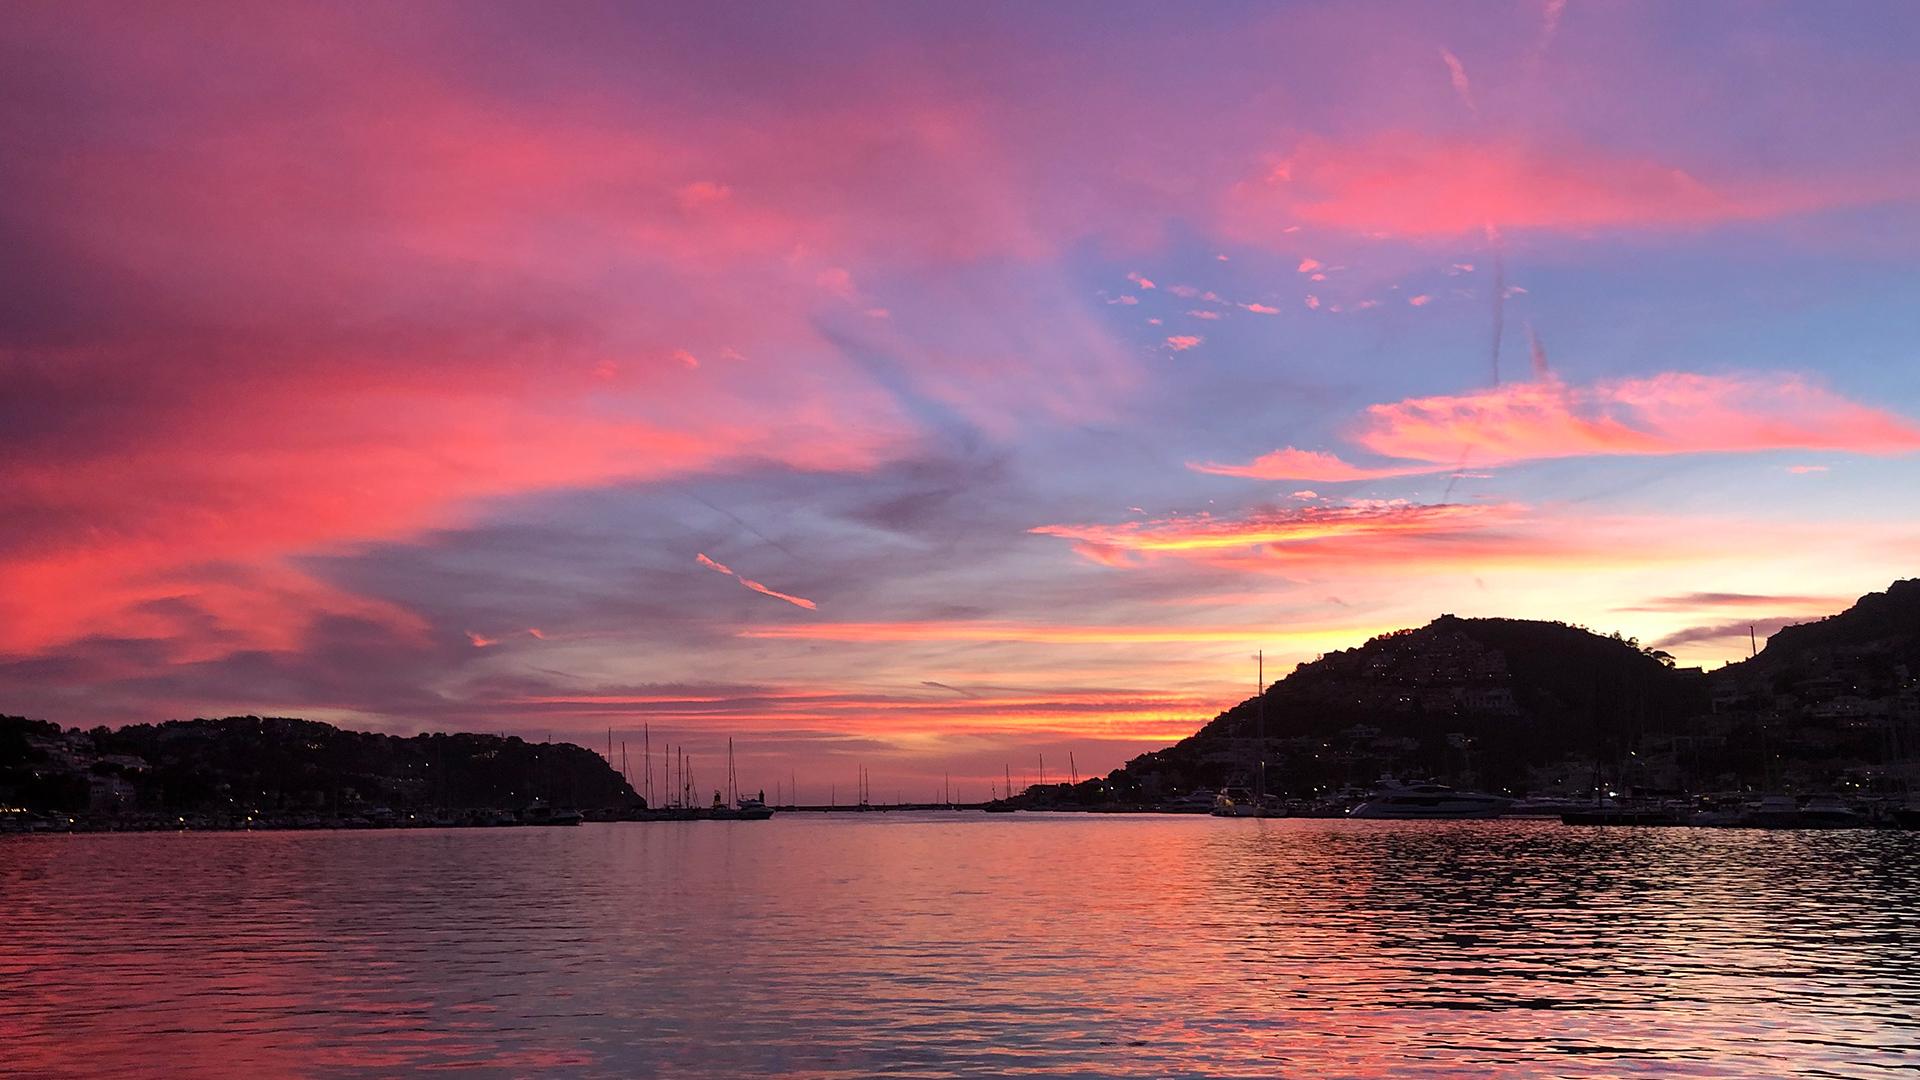 Pink sunset sea view